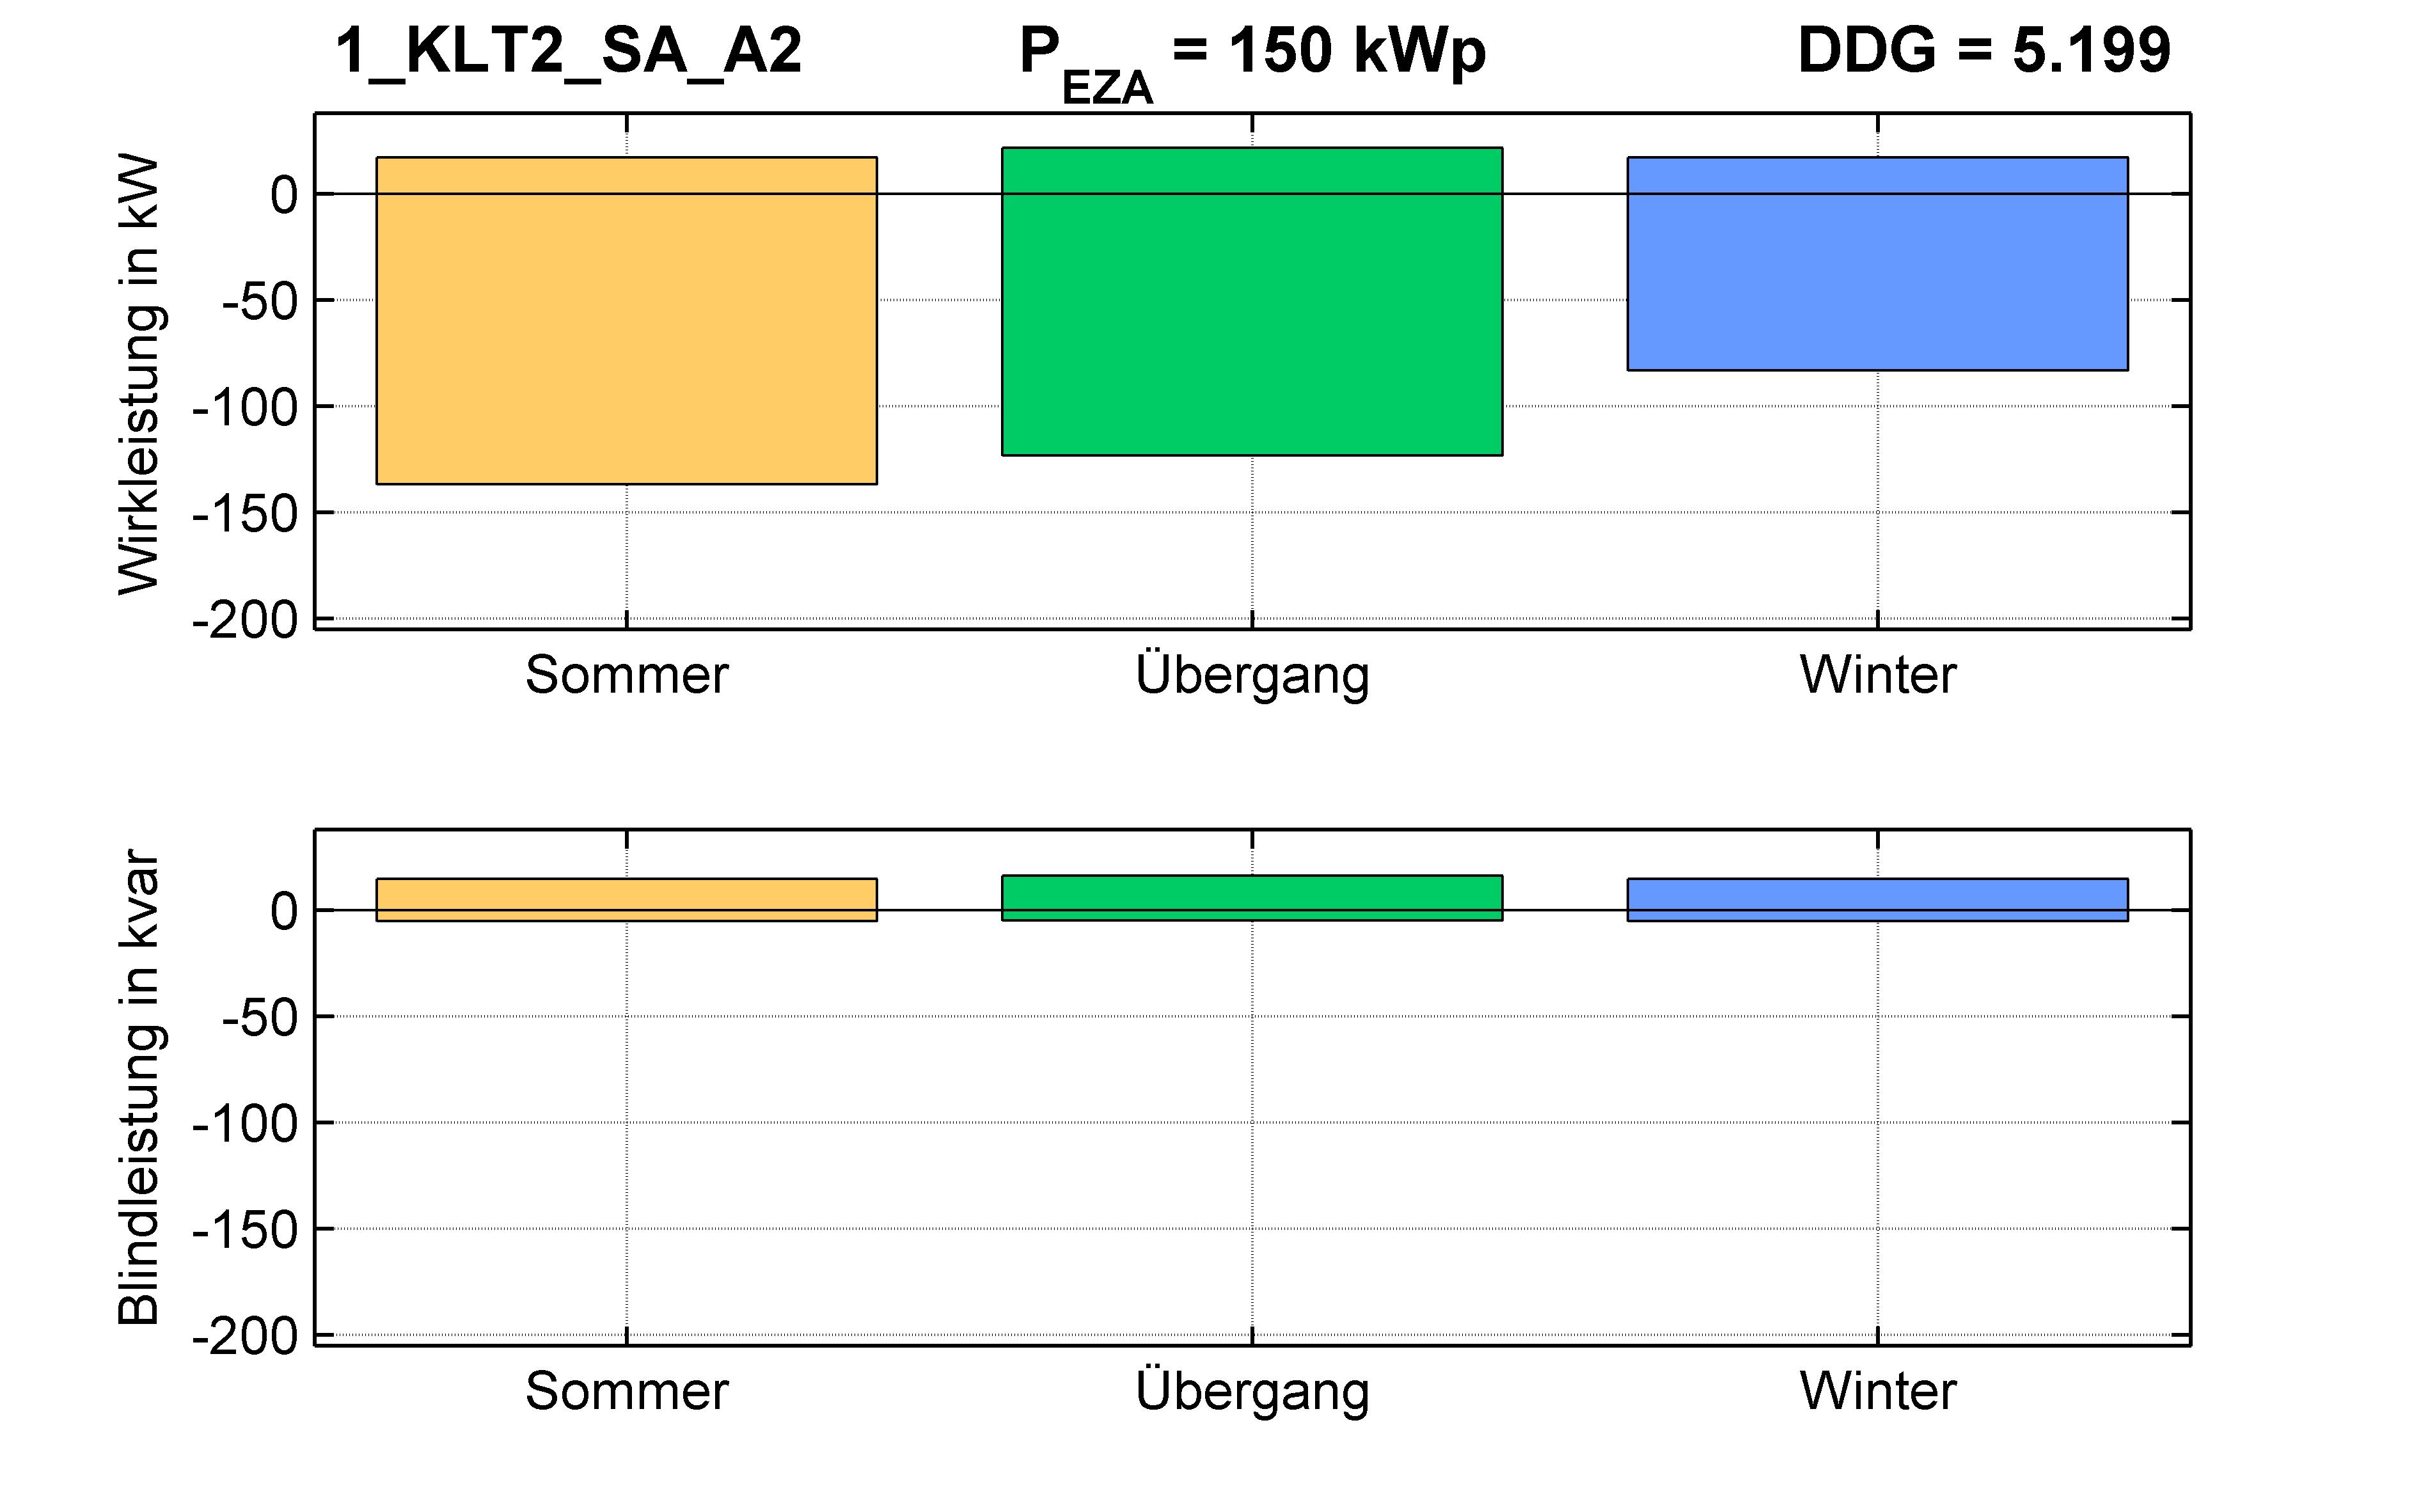 KLT2 | KABEL (SA) A2 | PQ-Bilanz